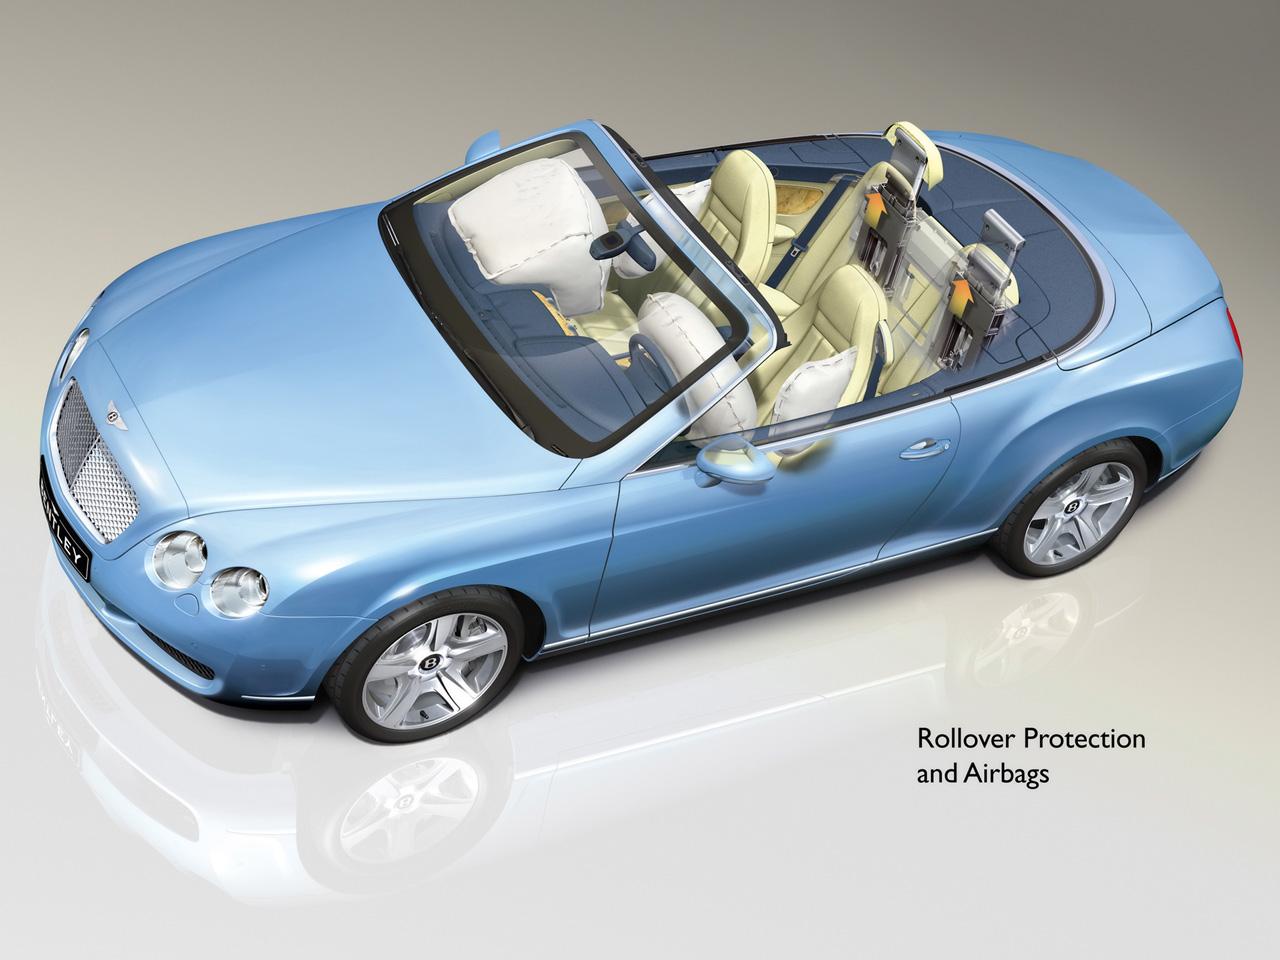 bentley continental gtc cabriolet 4 places et 300km h. Black Bedroom Furniture Sets. Home Design Ideas